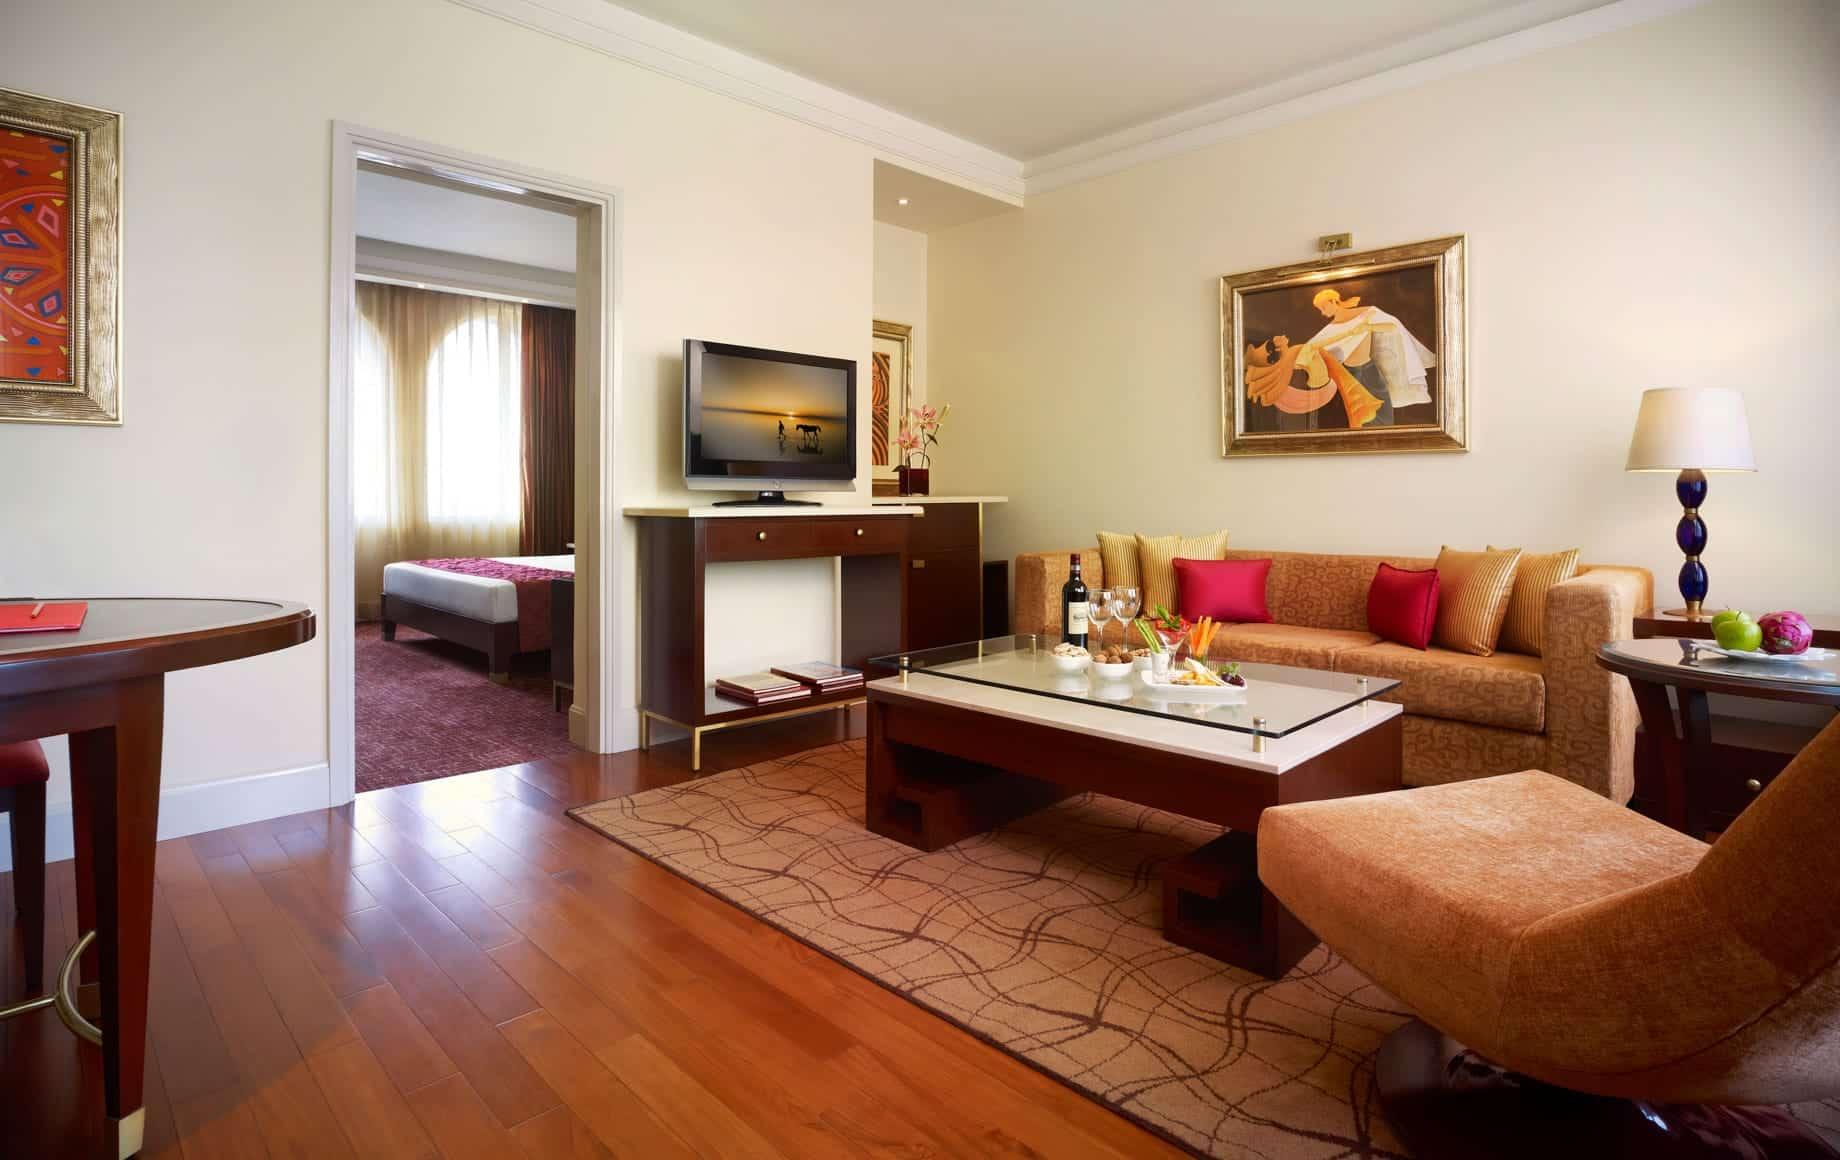 Varanasi Hotel Room View